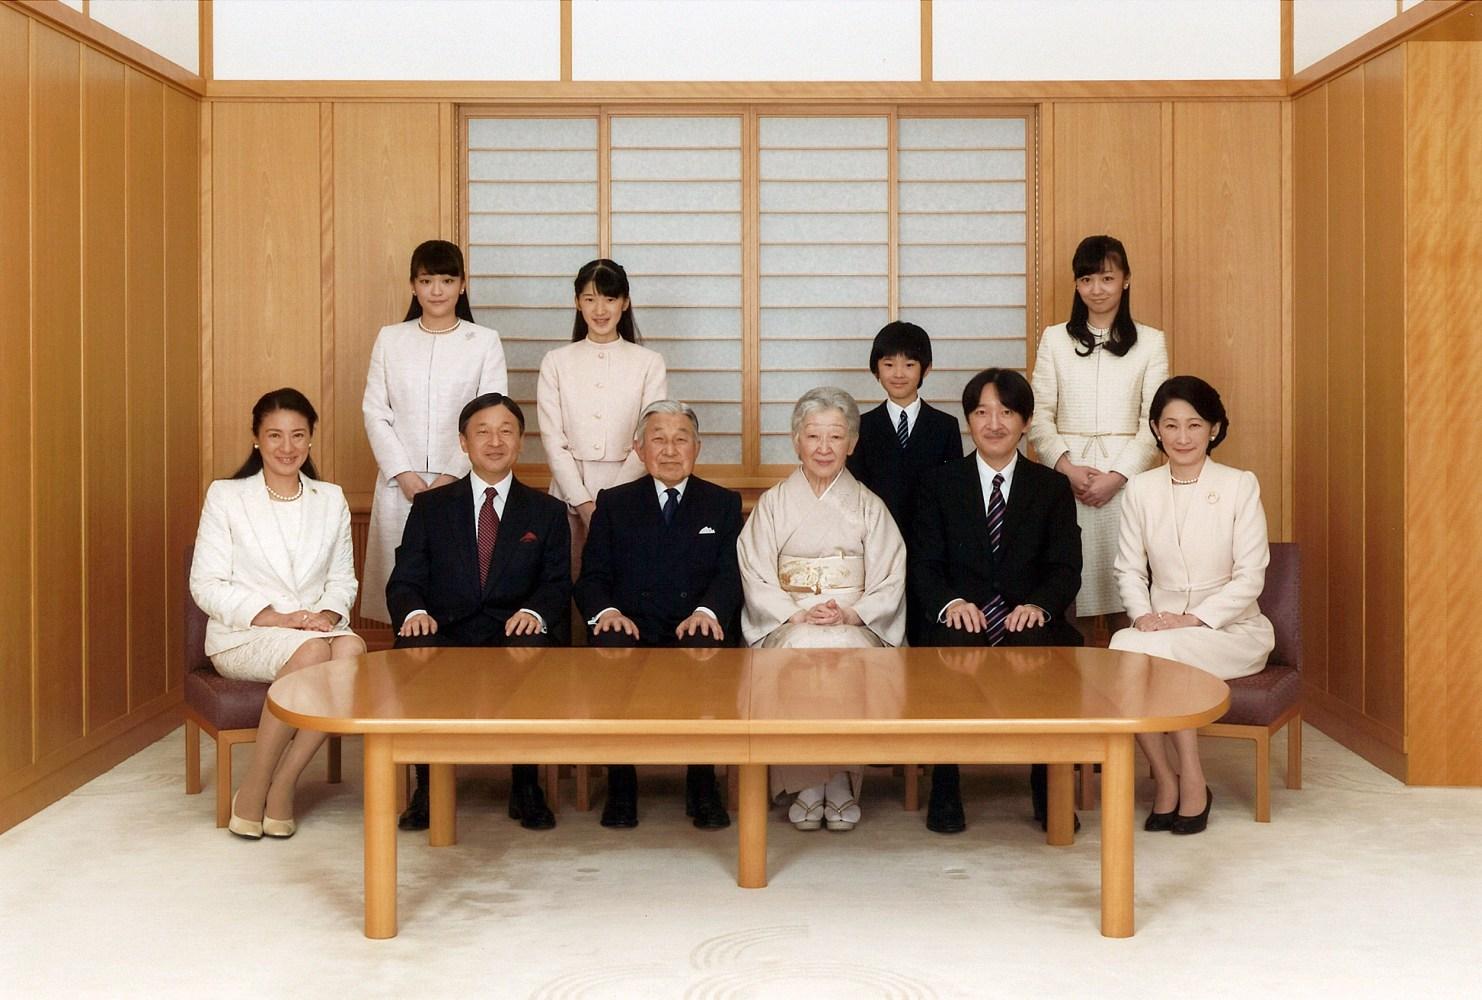 japan 39 s royal household faces major challenges in line of succession nbc news. Black Bedroom Furniture Sets. Home Design Ideas